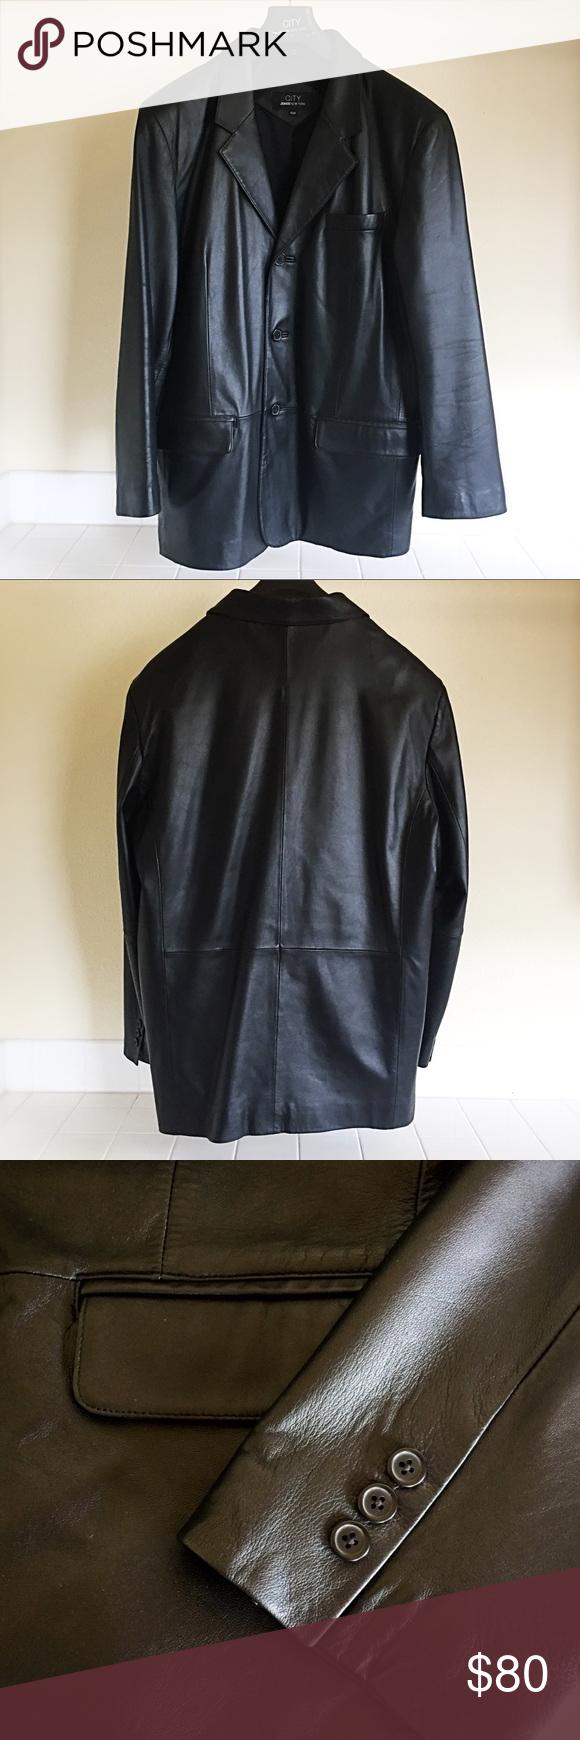 City Jones New York Leather Jacket Leather Jacket Classy Coat Jones New York